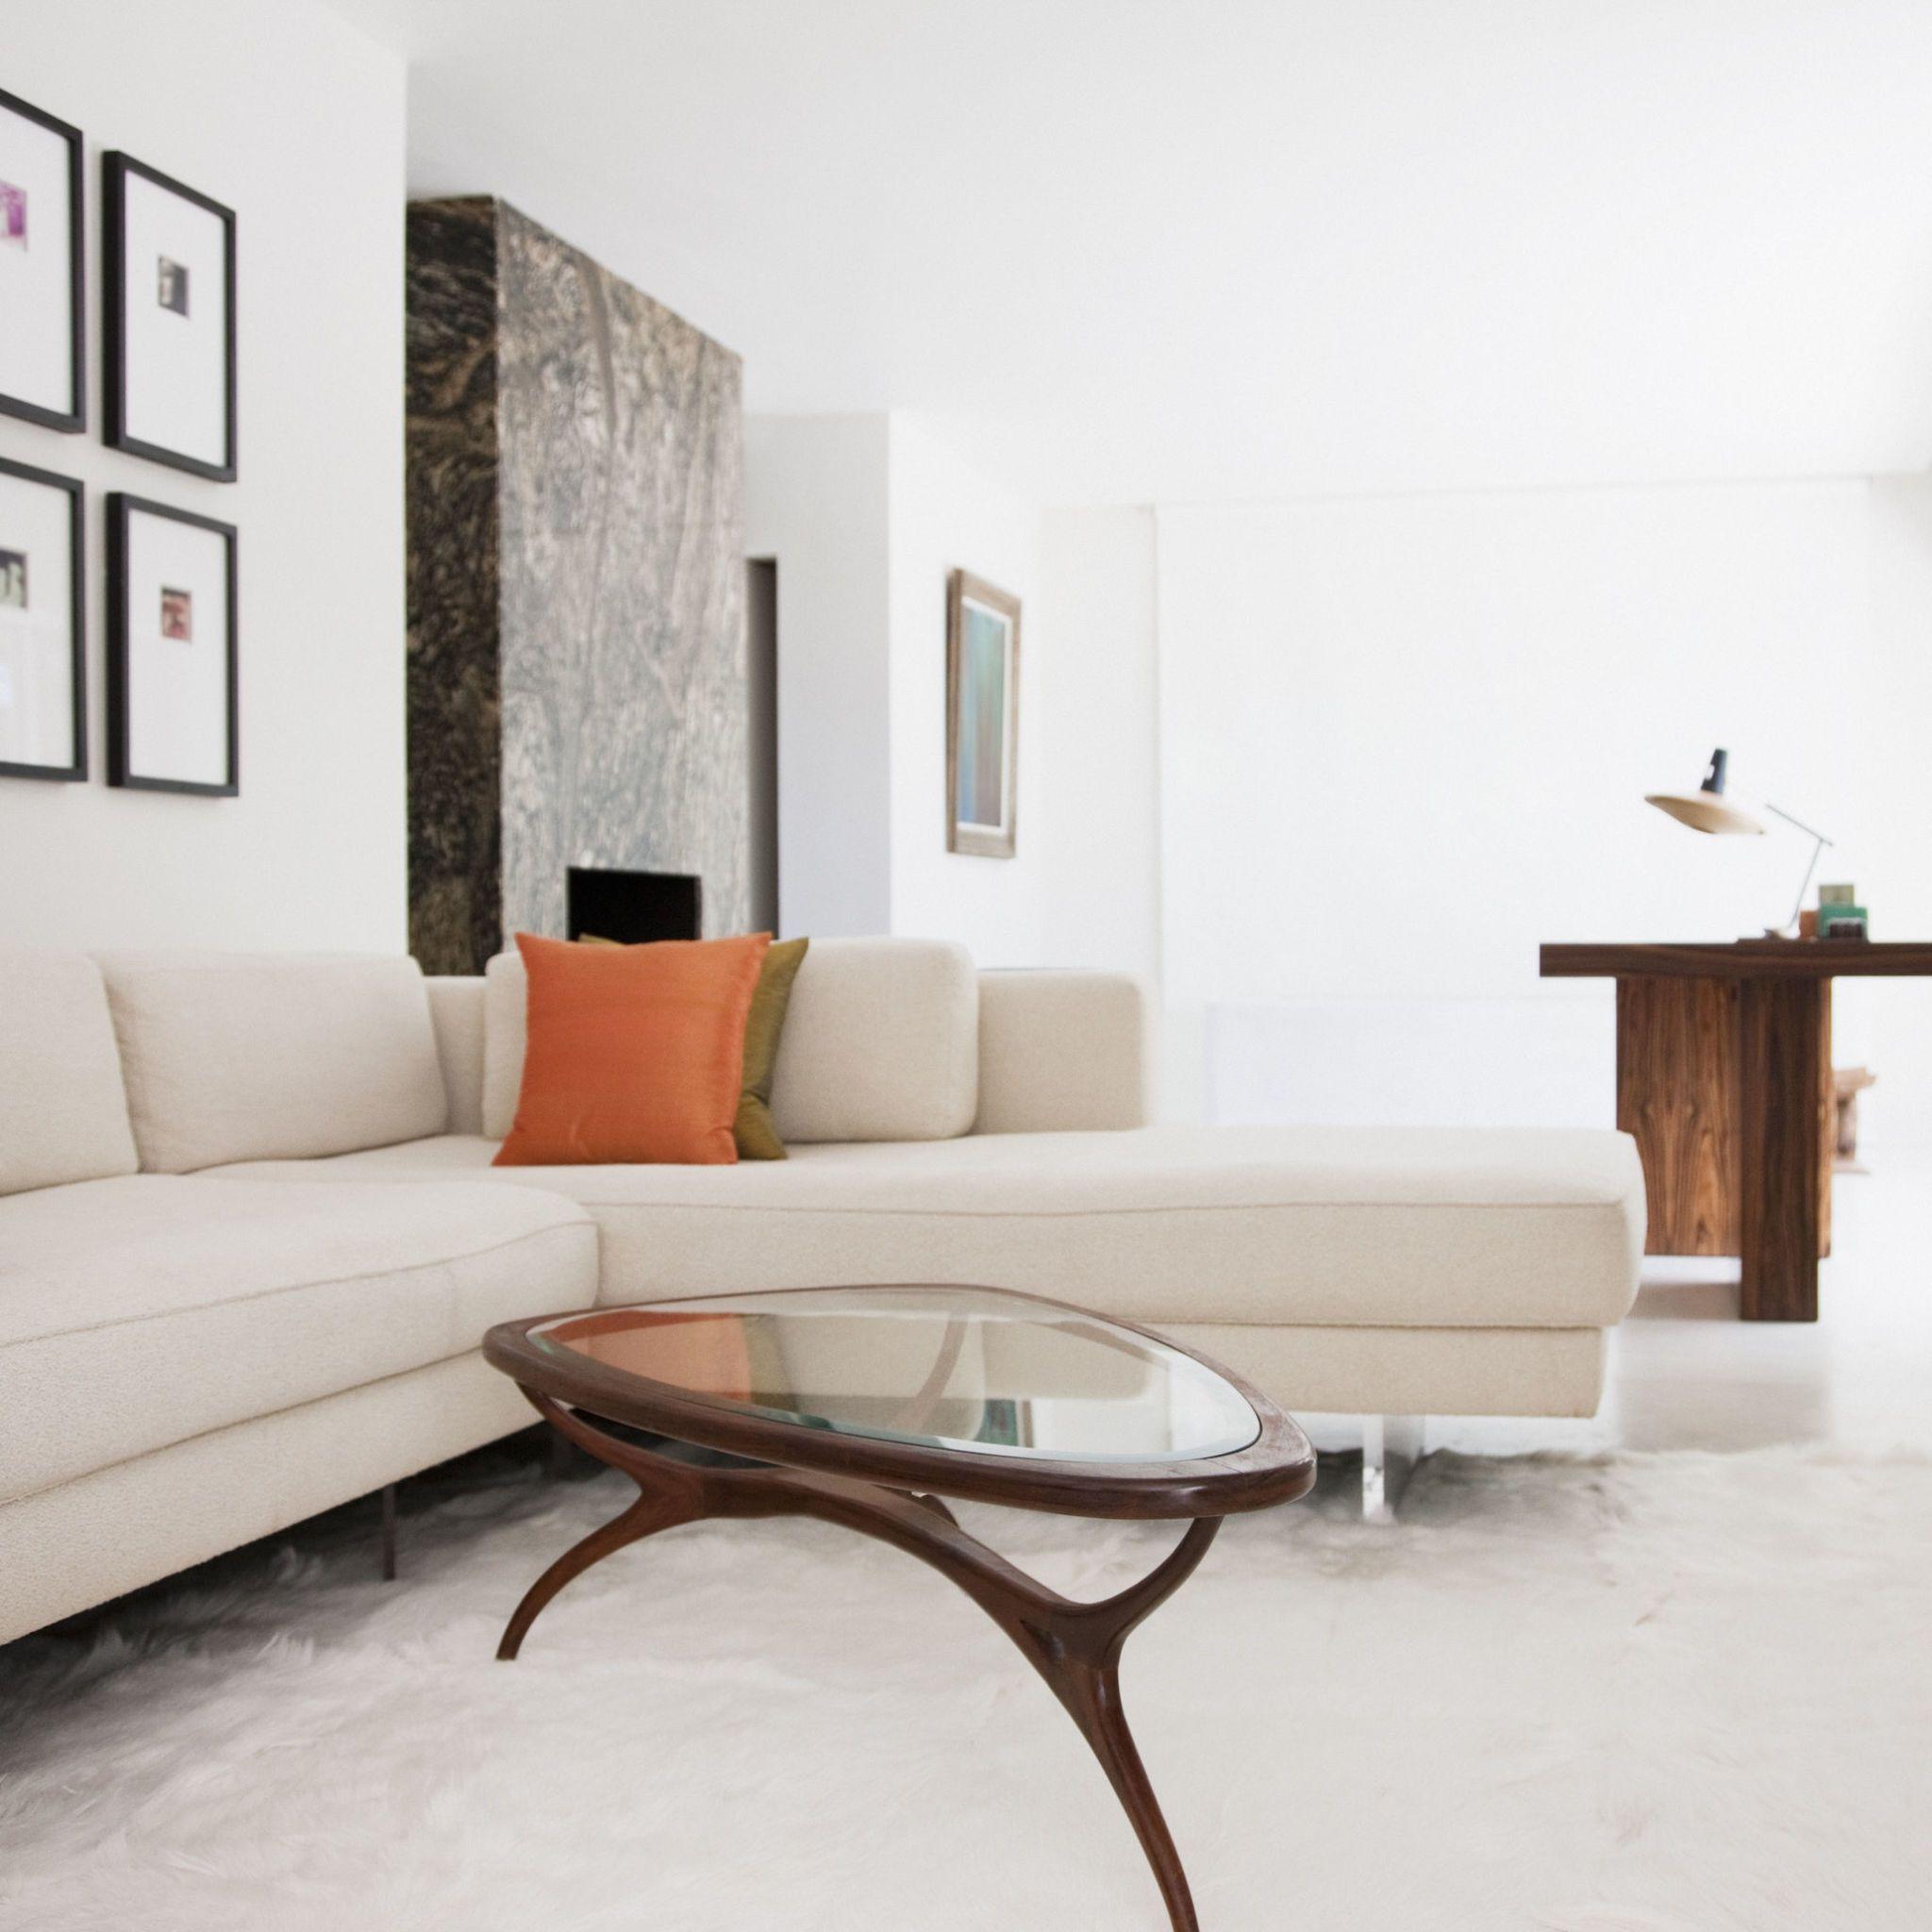 2017 Best Home Decor TrendsWhats Trending For Interior Design 2017